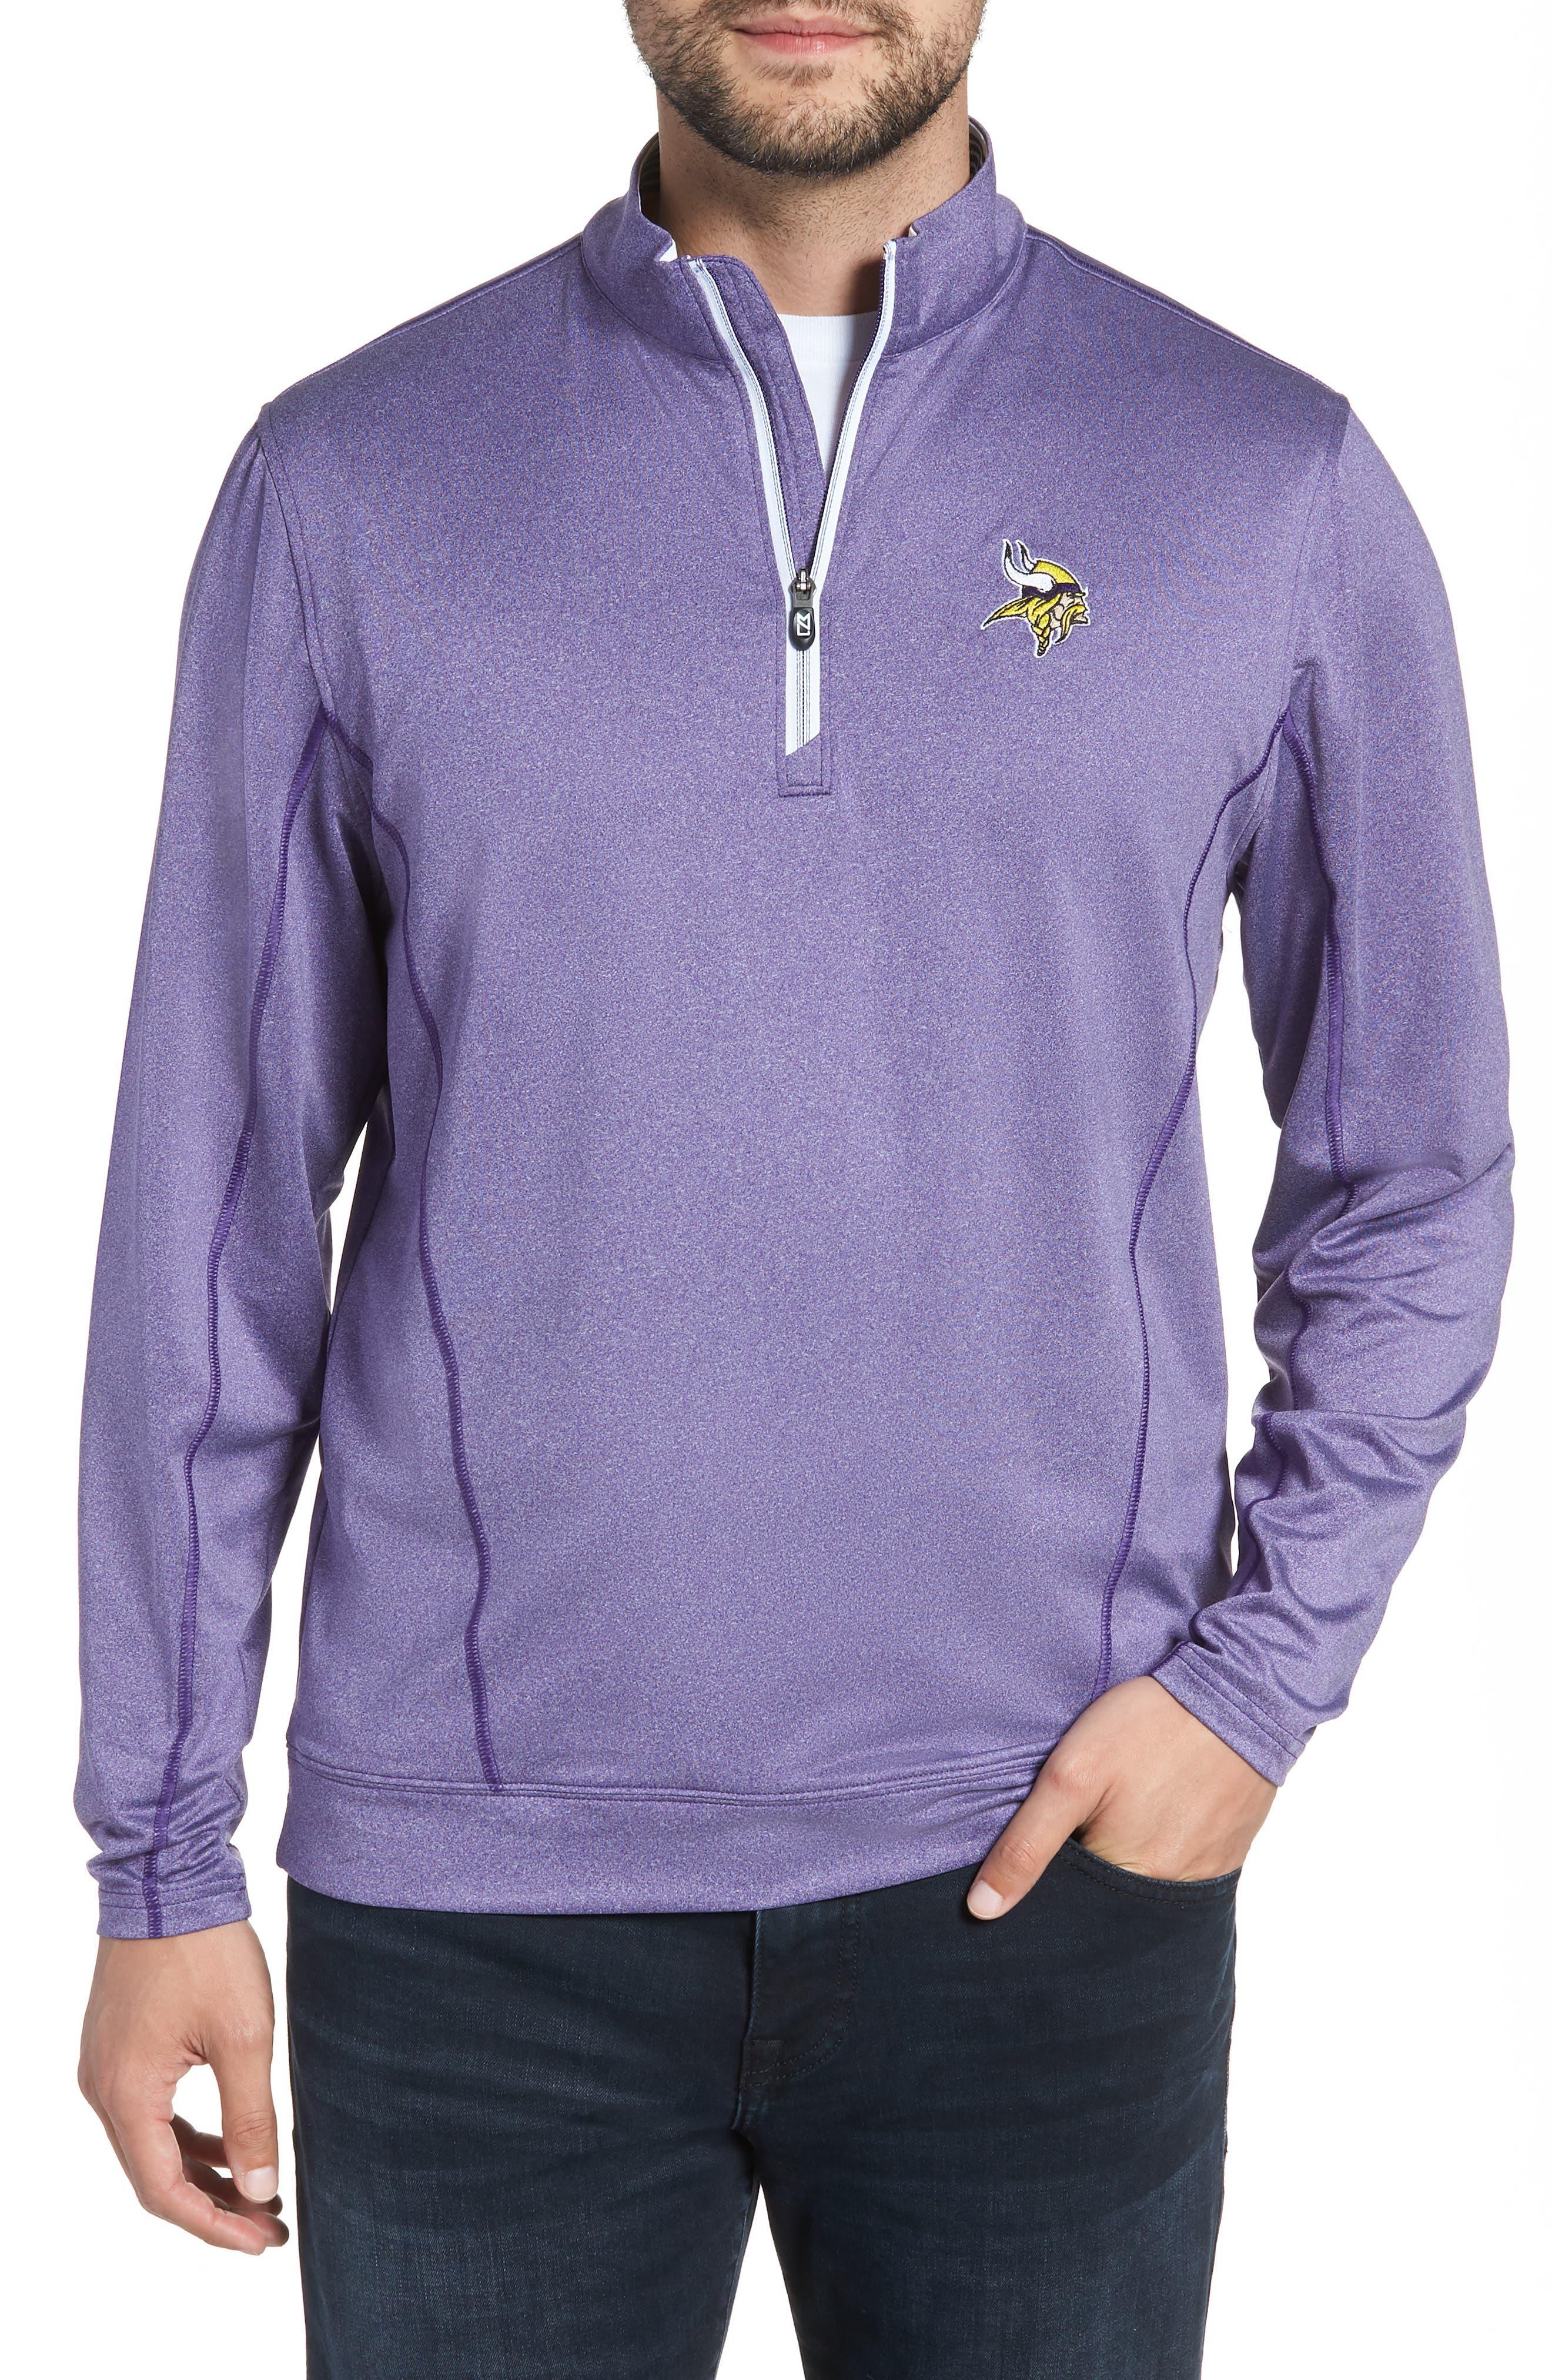 Endurance Minnesota Vikings Regular Fit Pullover,                         Main,                         color, COLLEGE PURPLE HEATHER